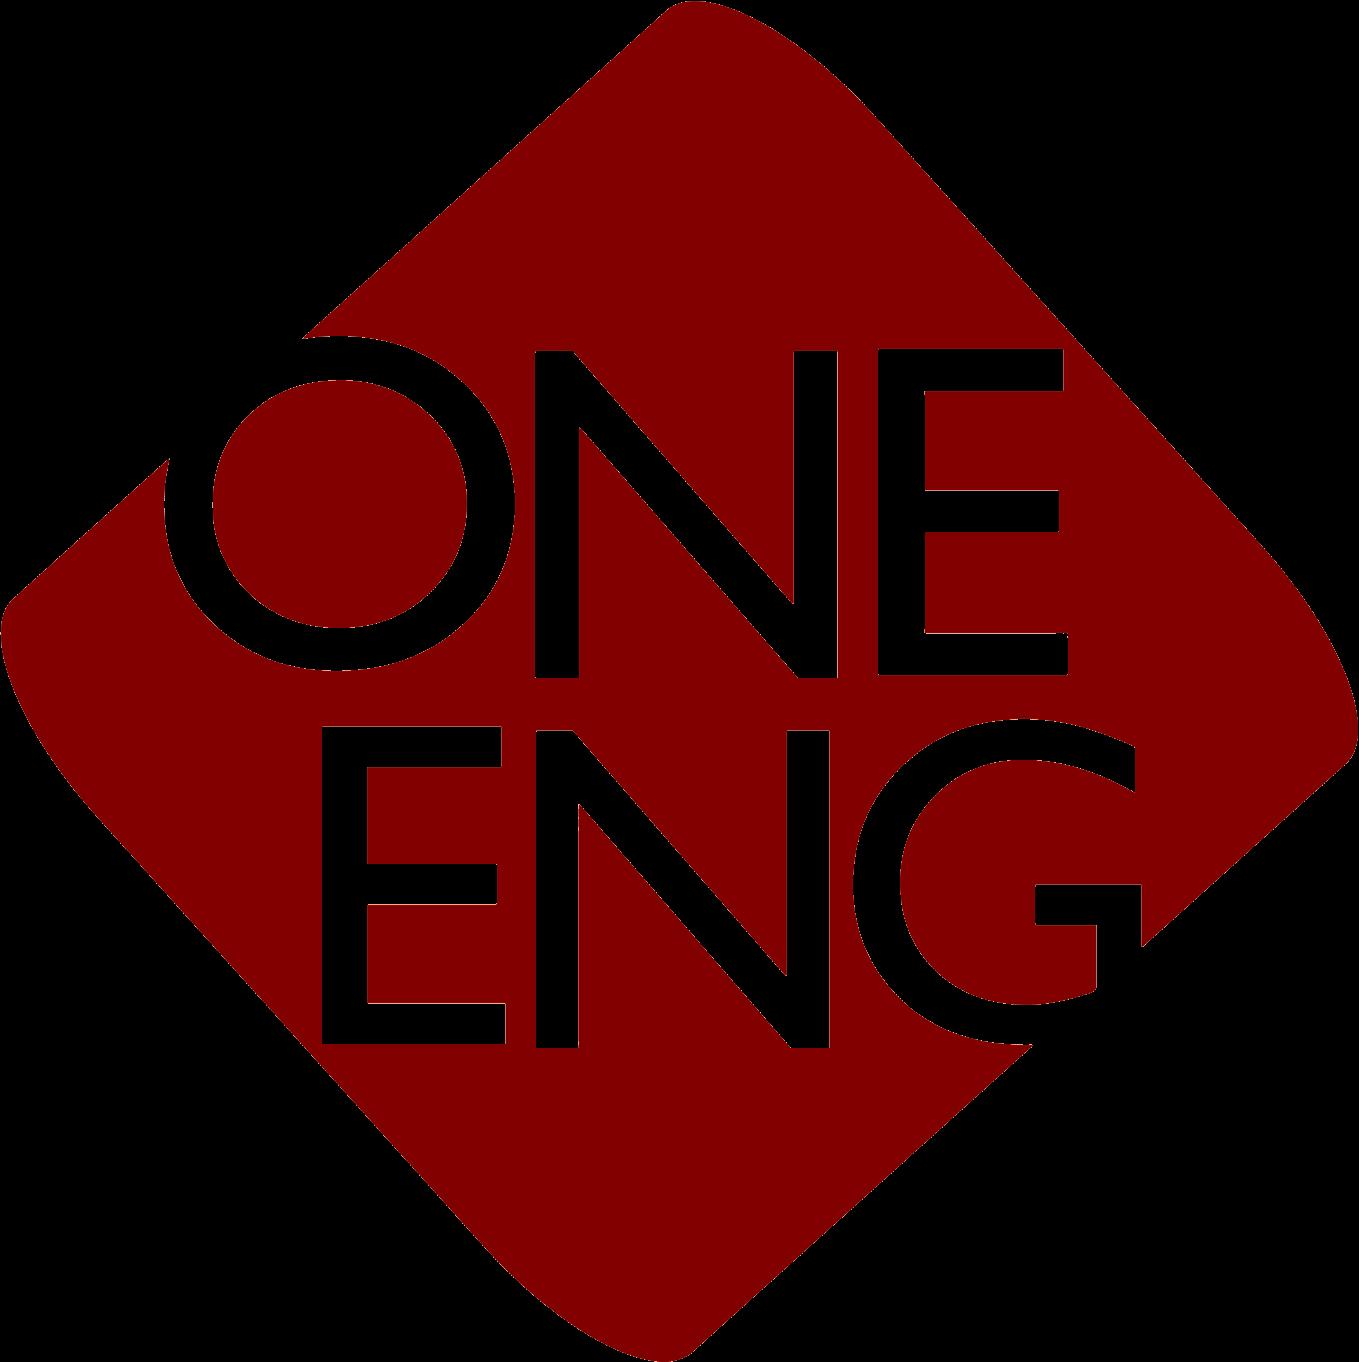 CASCONE Engineering s.r.l.